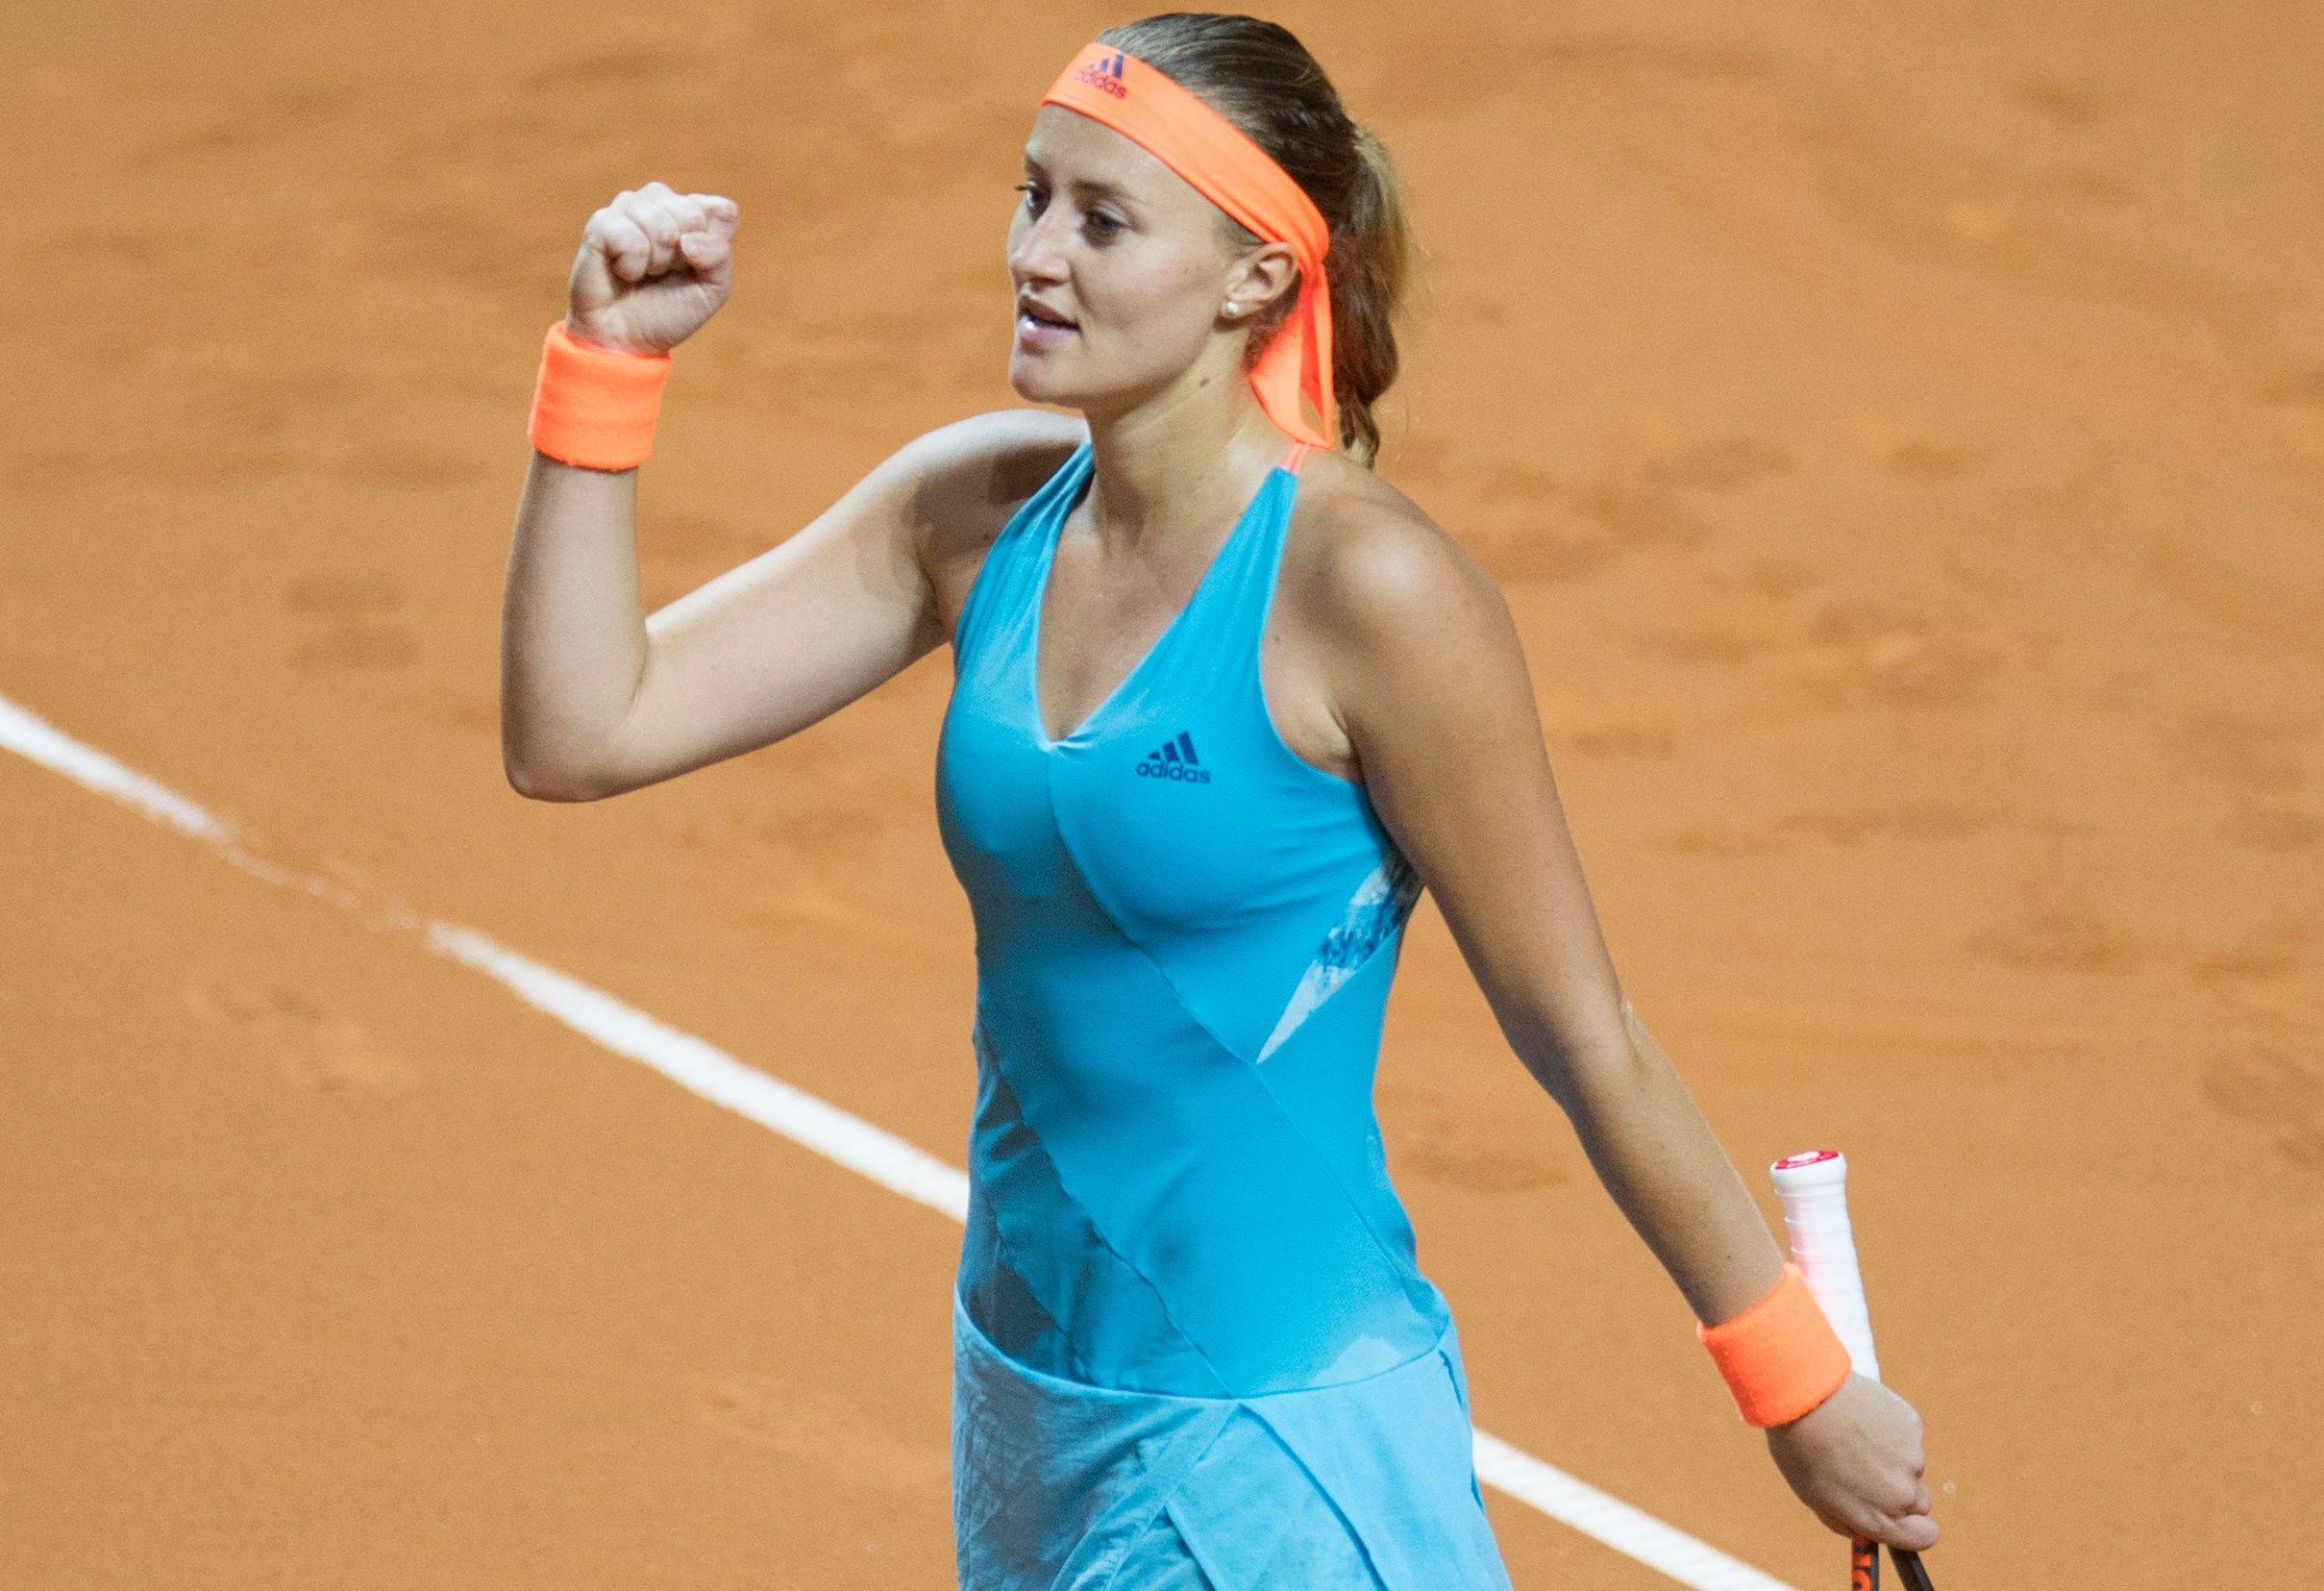 Tennis - WTA - Stuttgart : Mladenovic impressionne face à Kerber